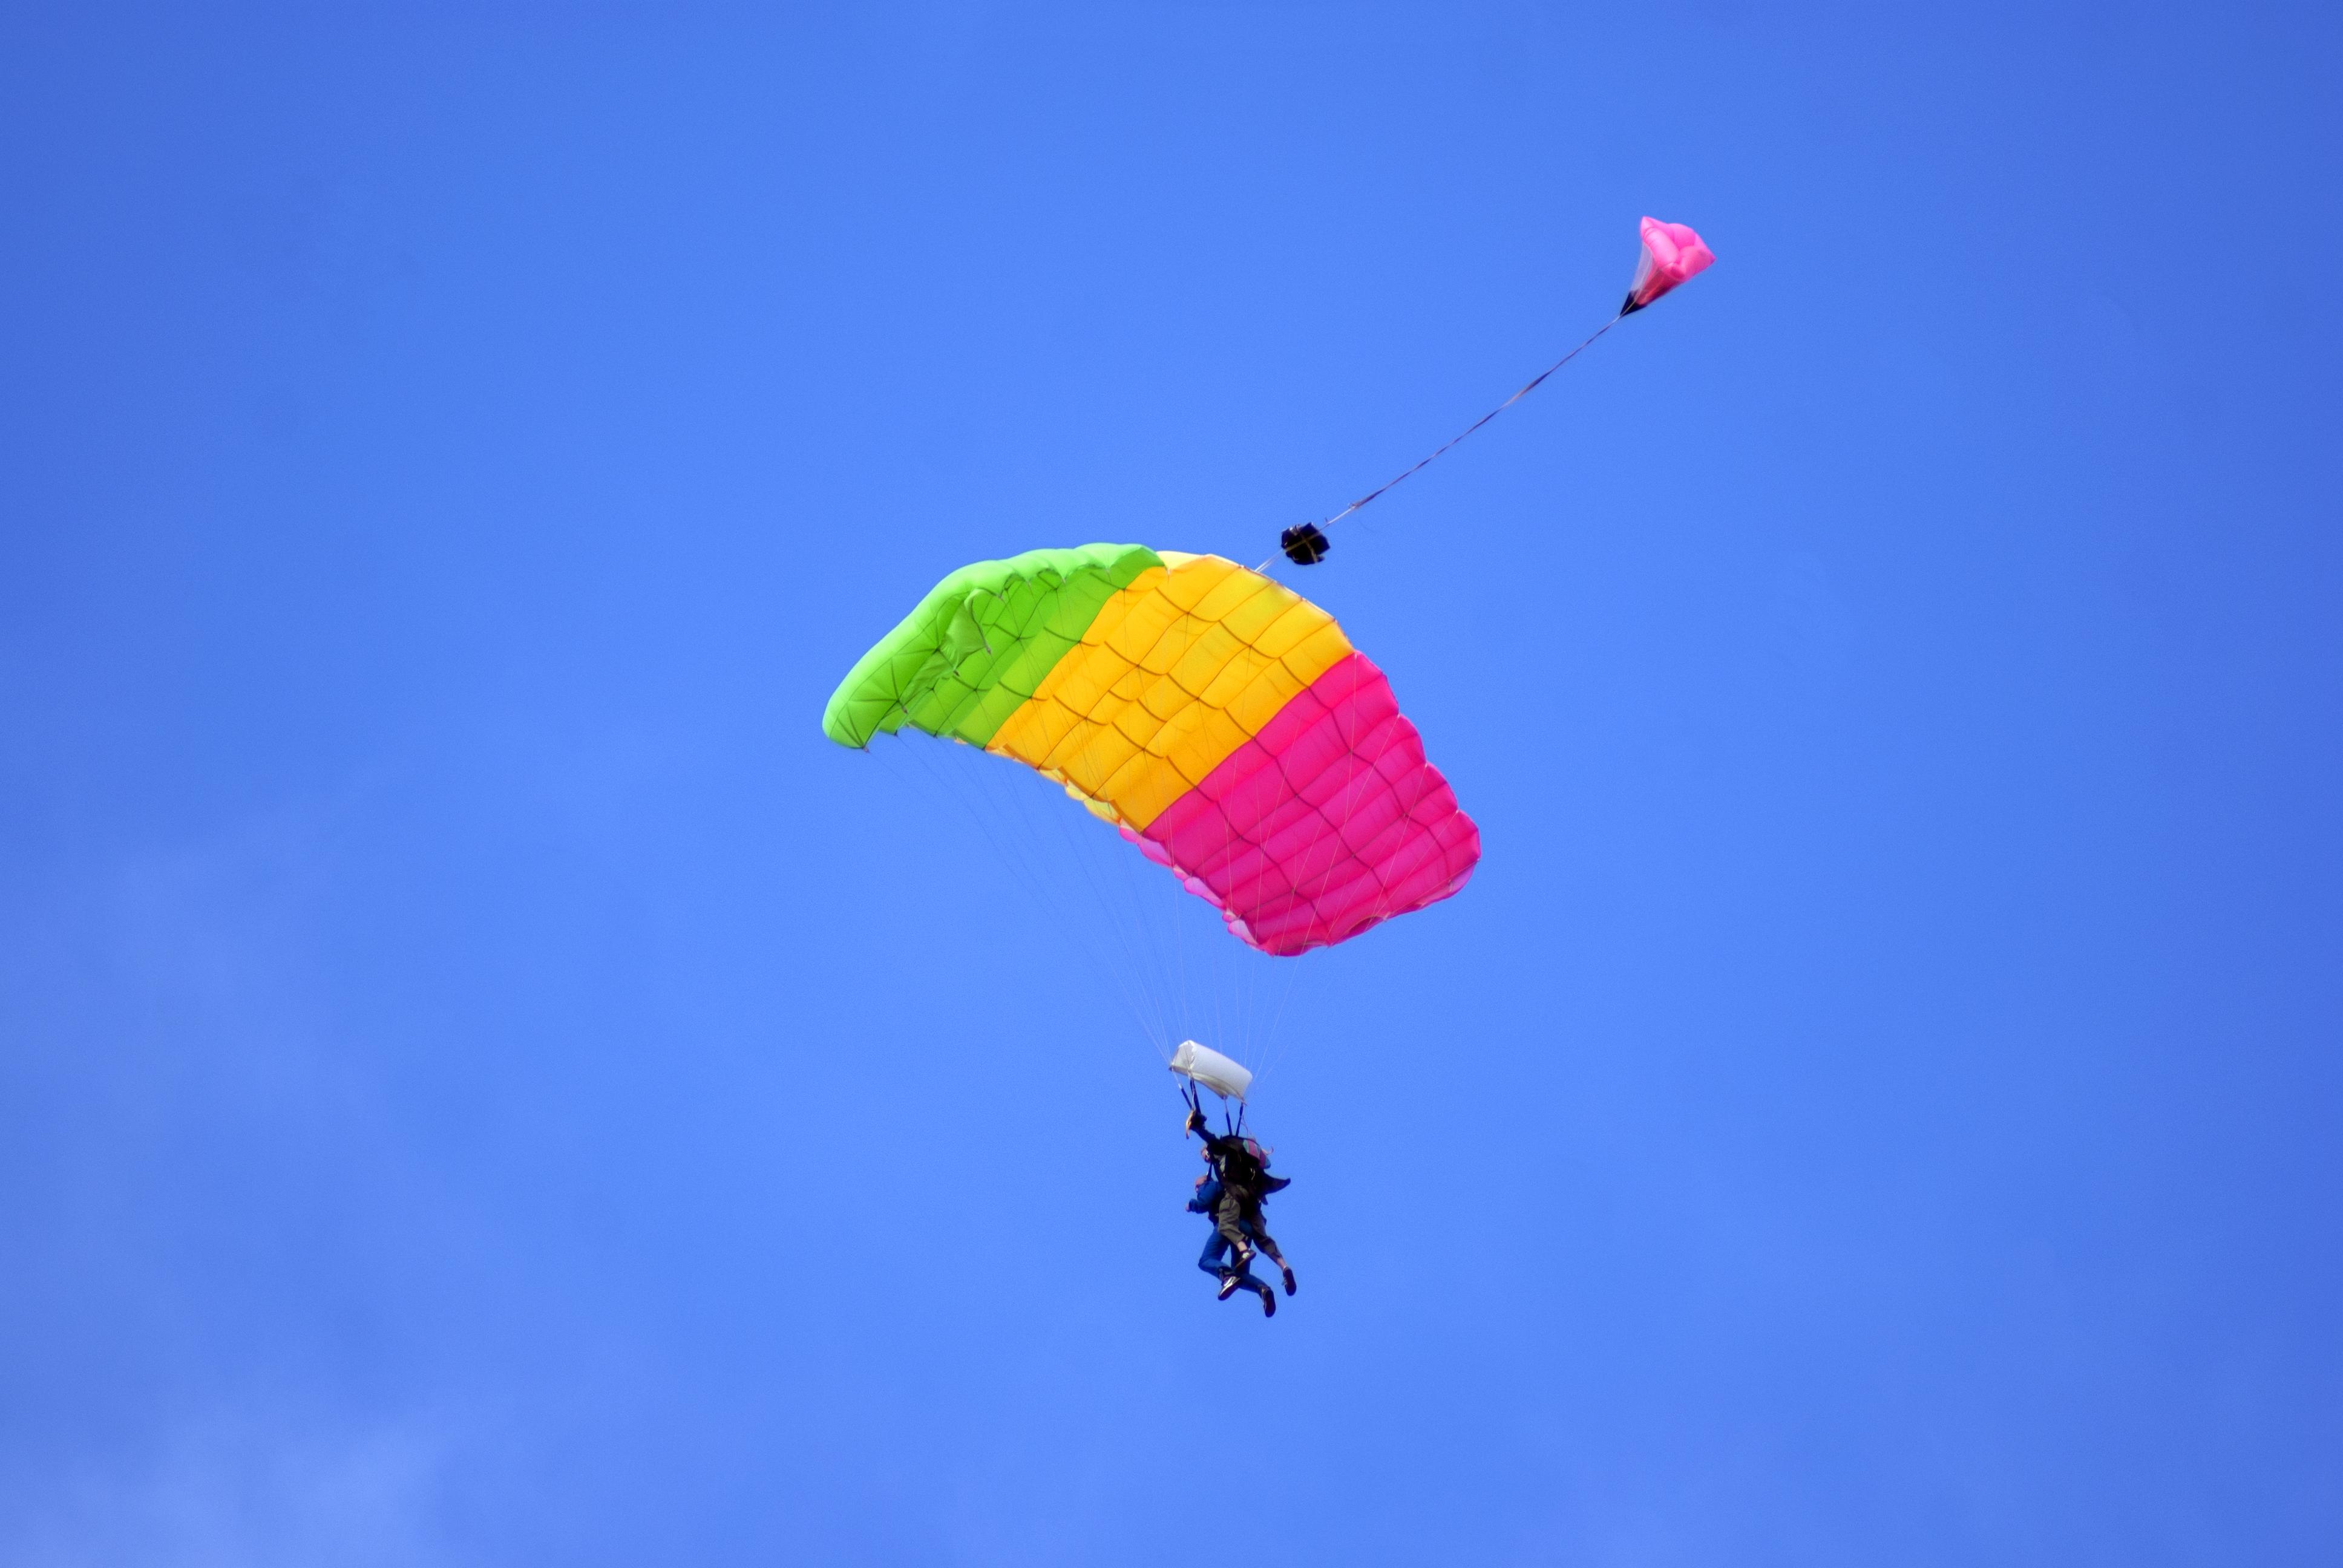 Tandem parachuting photo